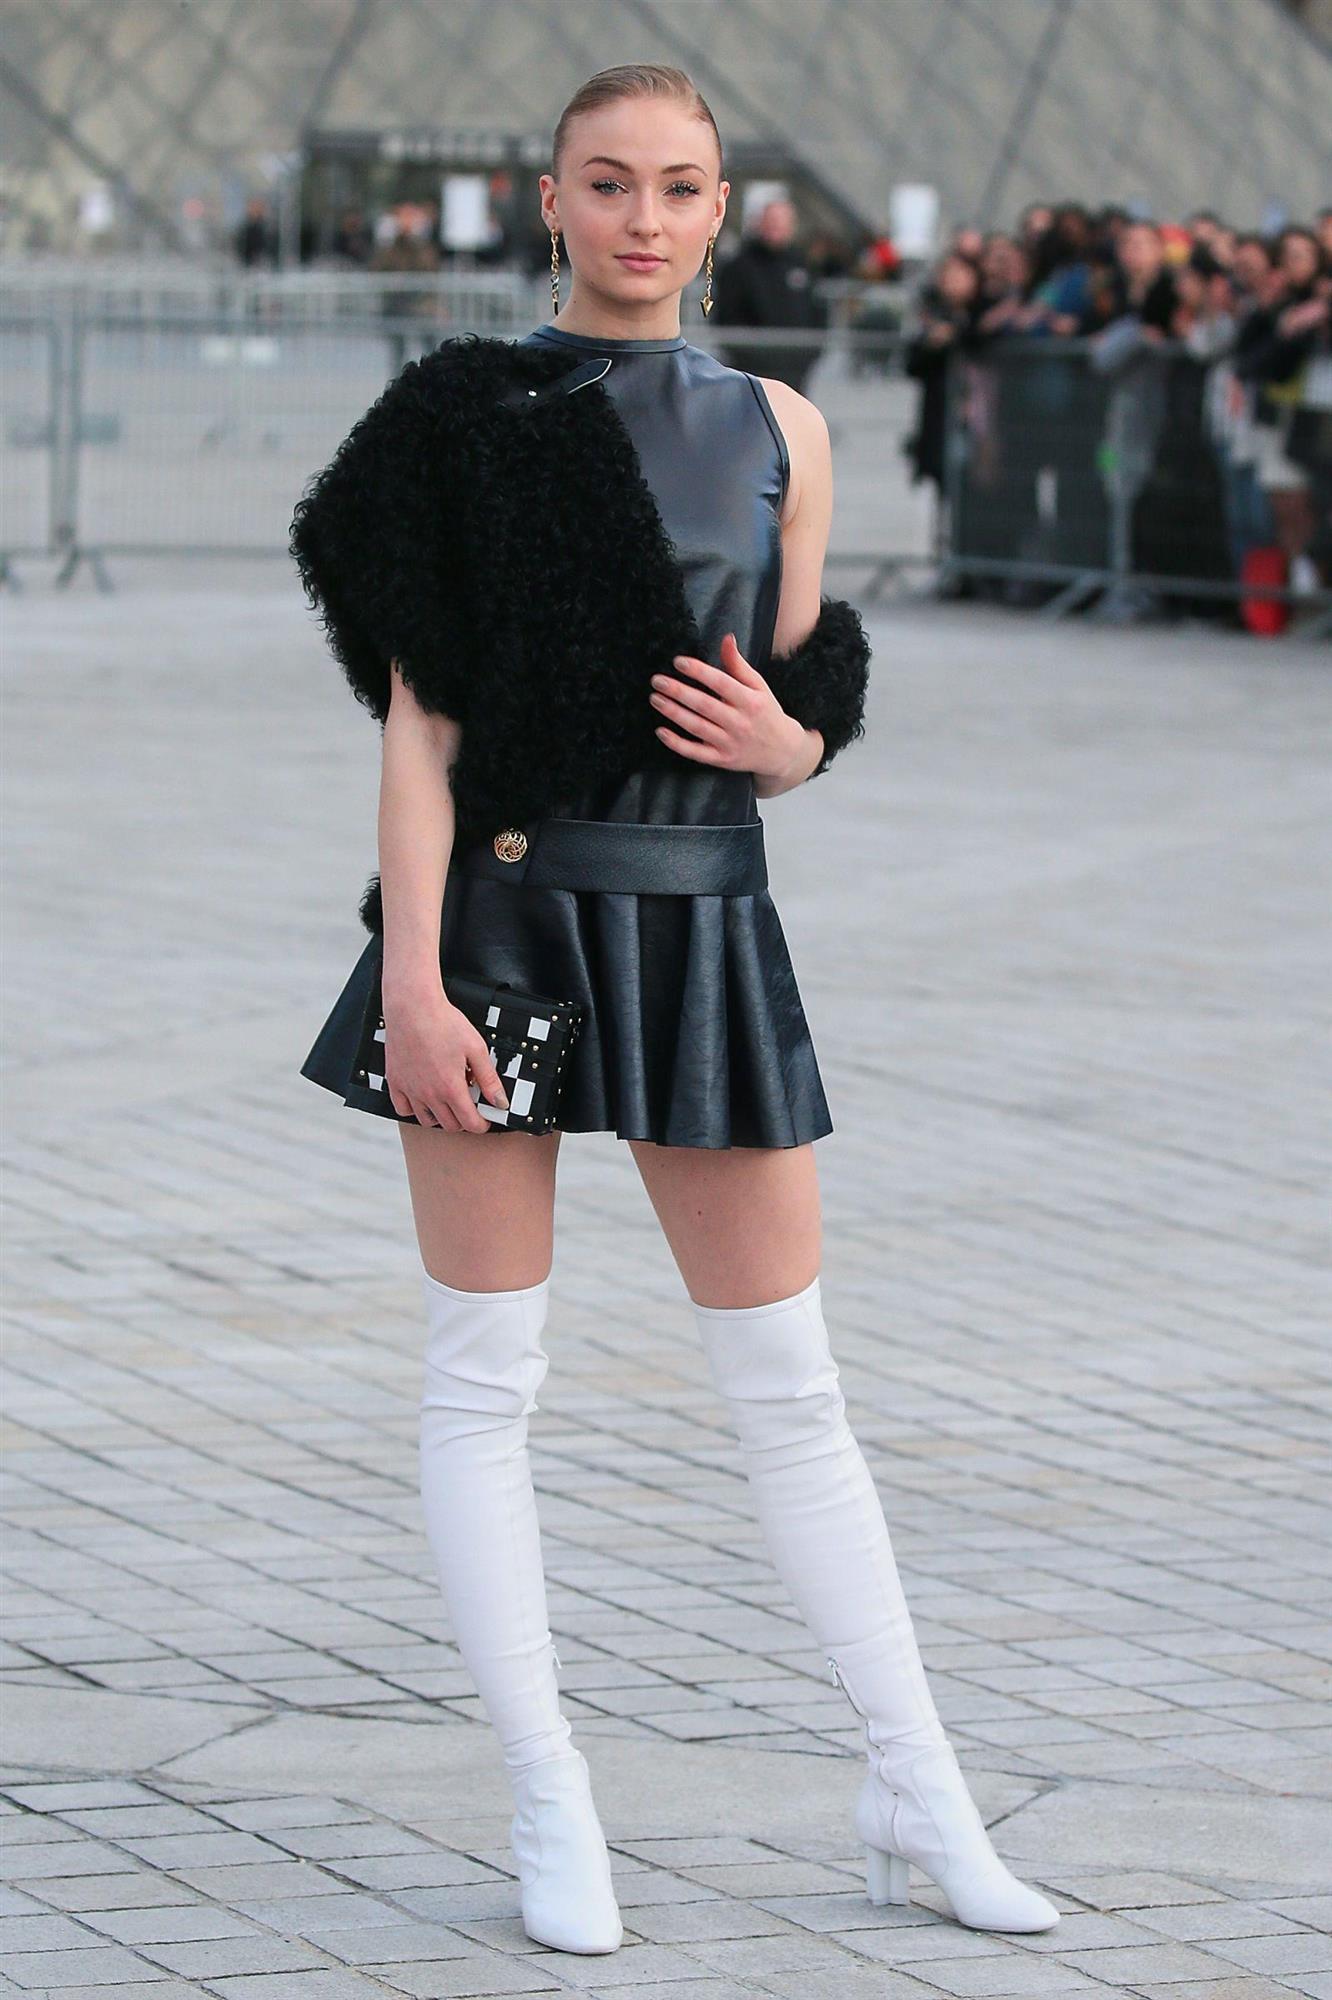 sophie turner con botas blancas